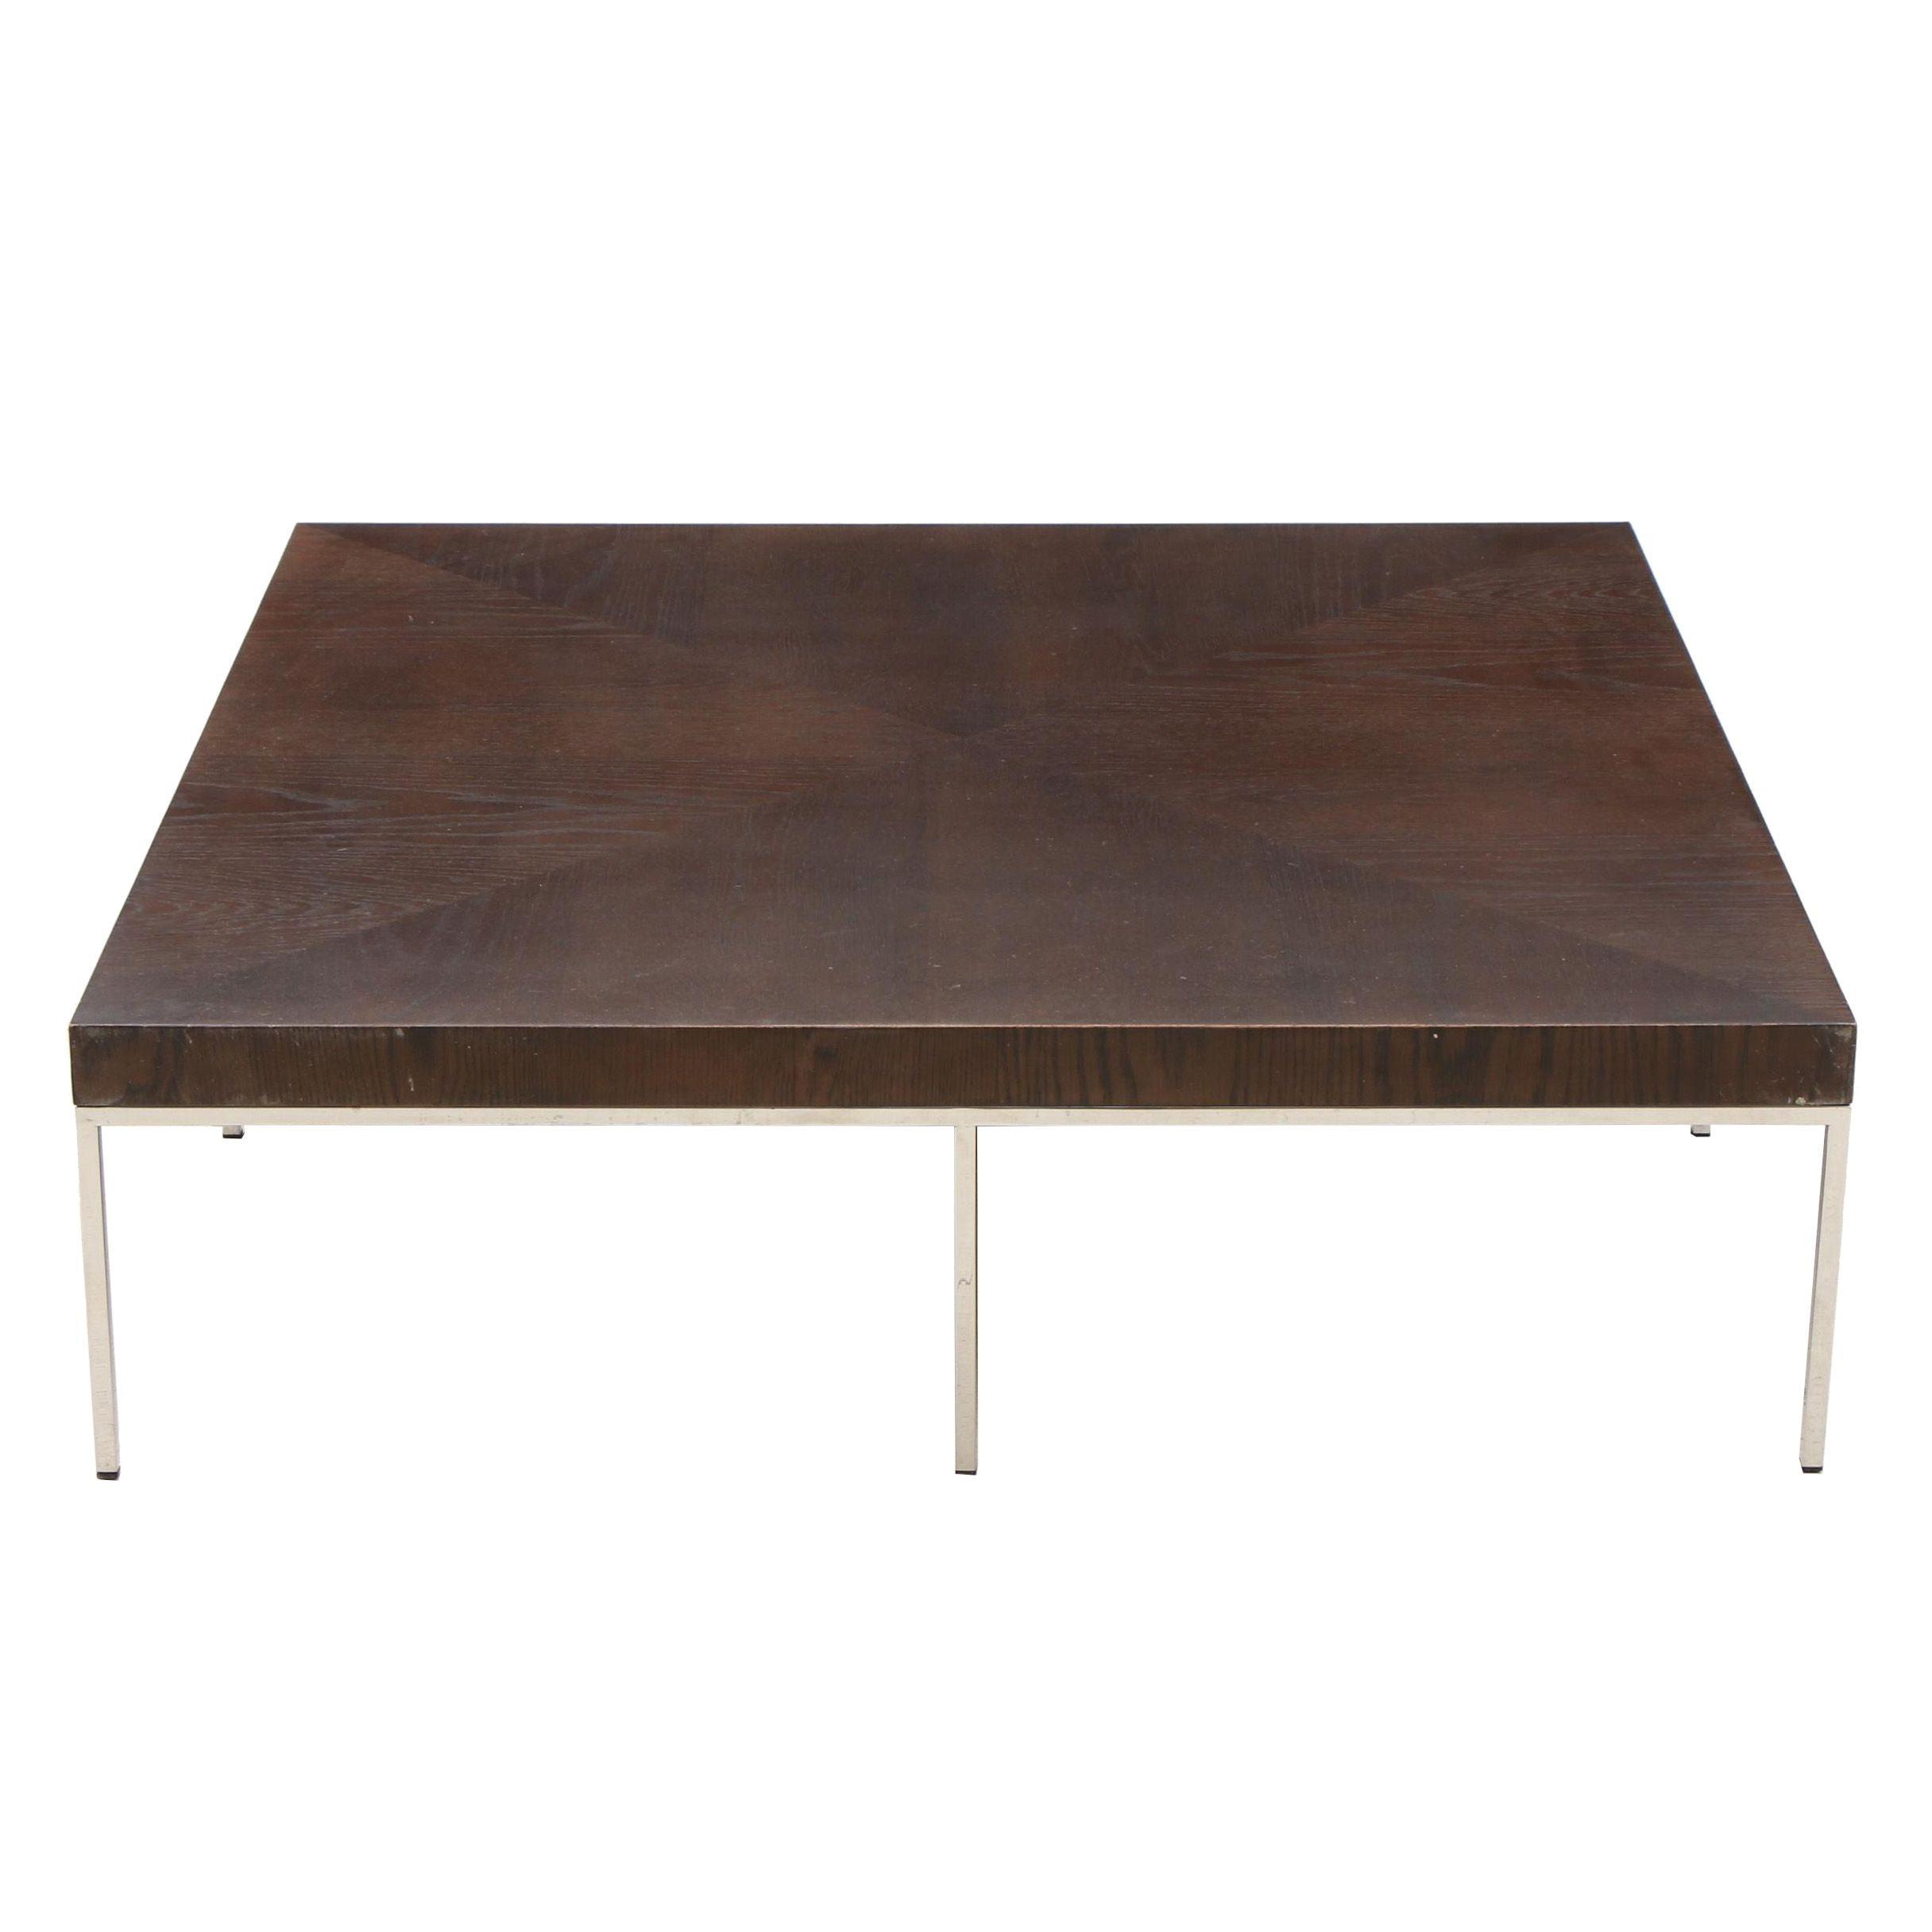 Modern Oak Coffee Table, Contemporary